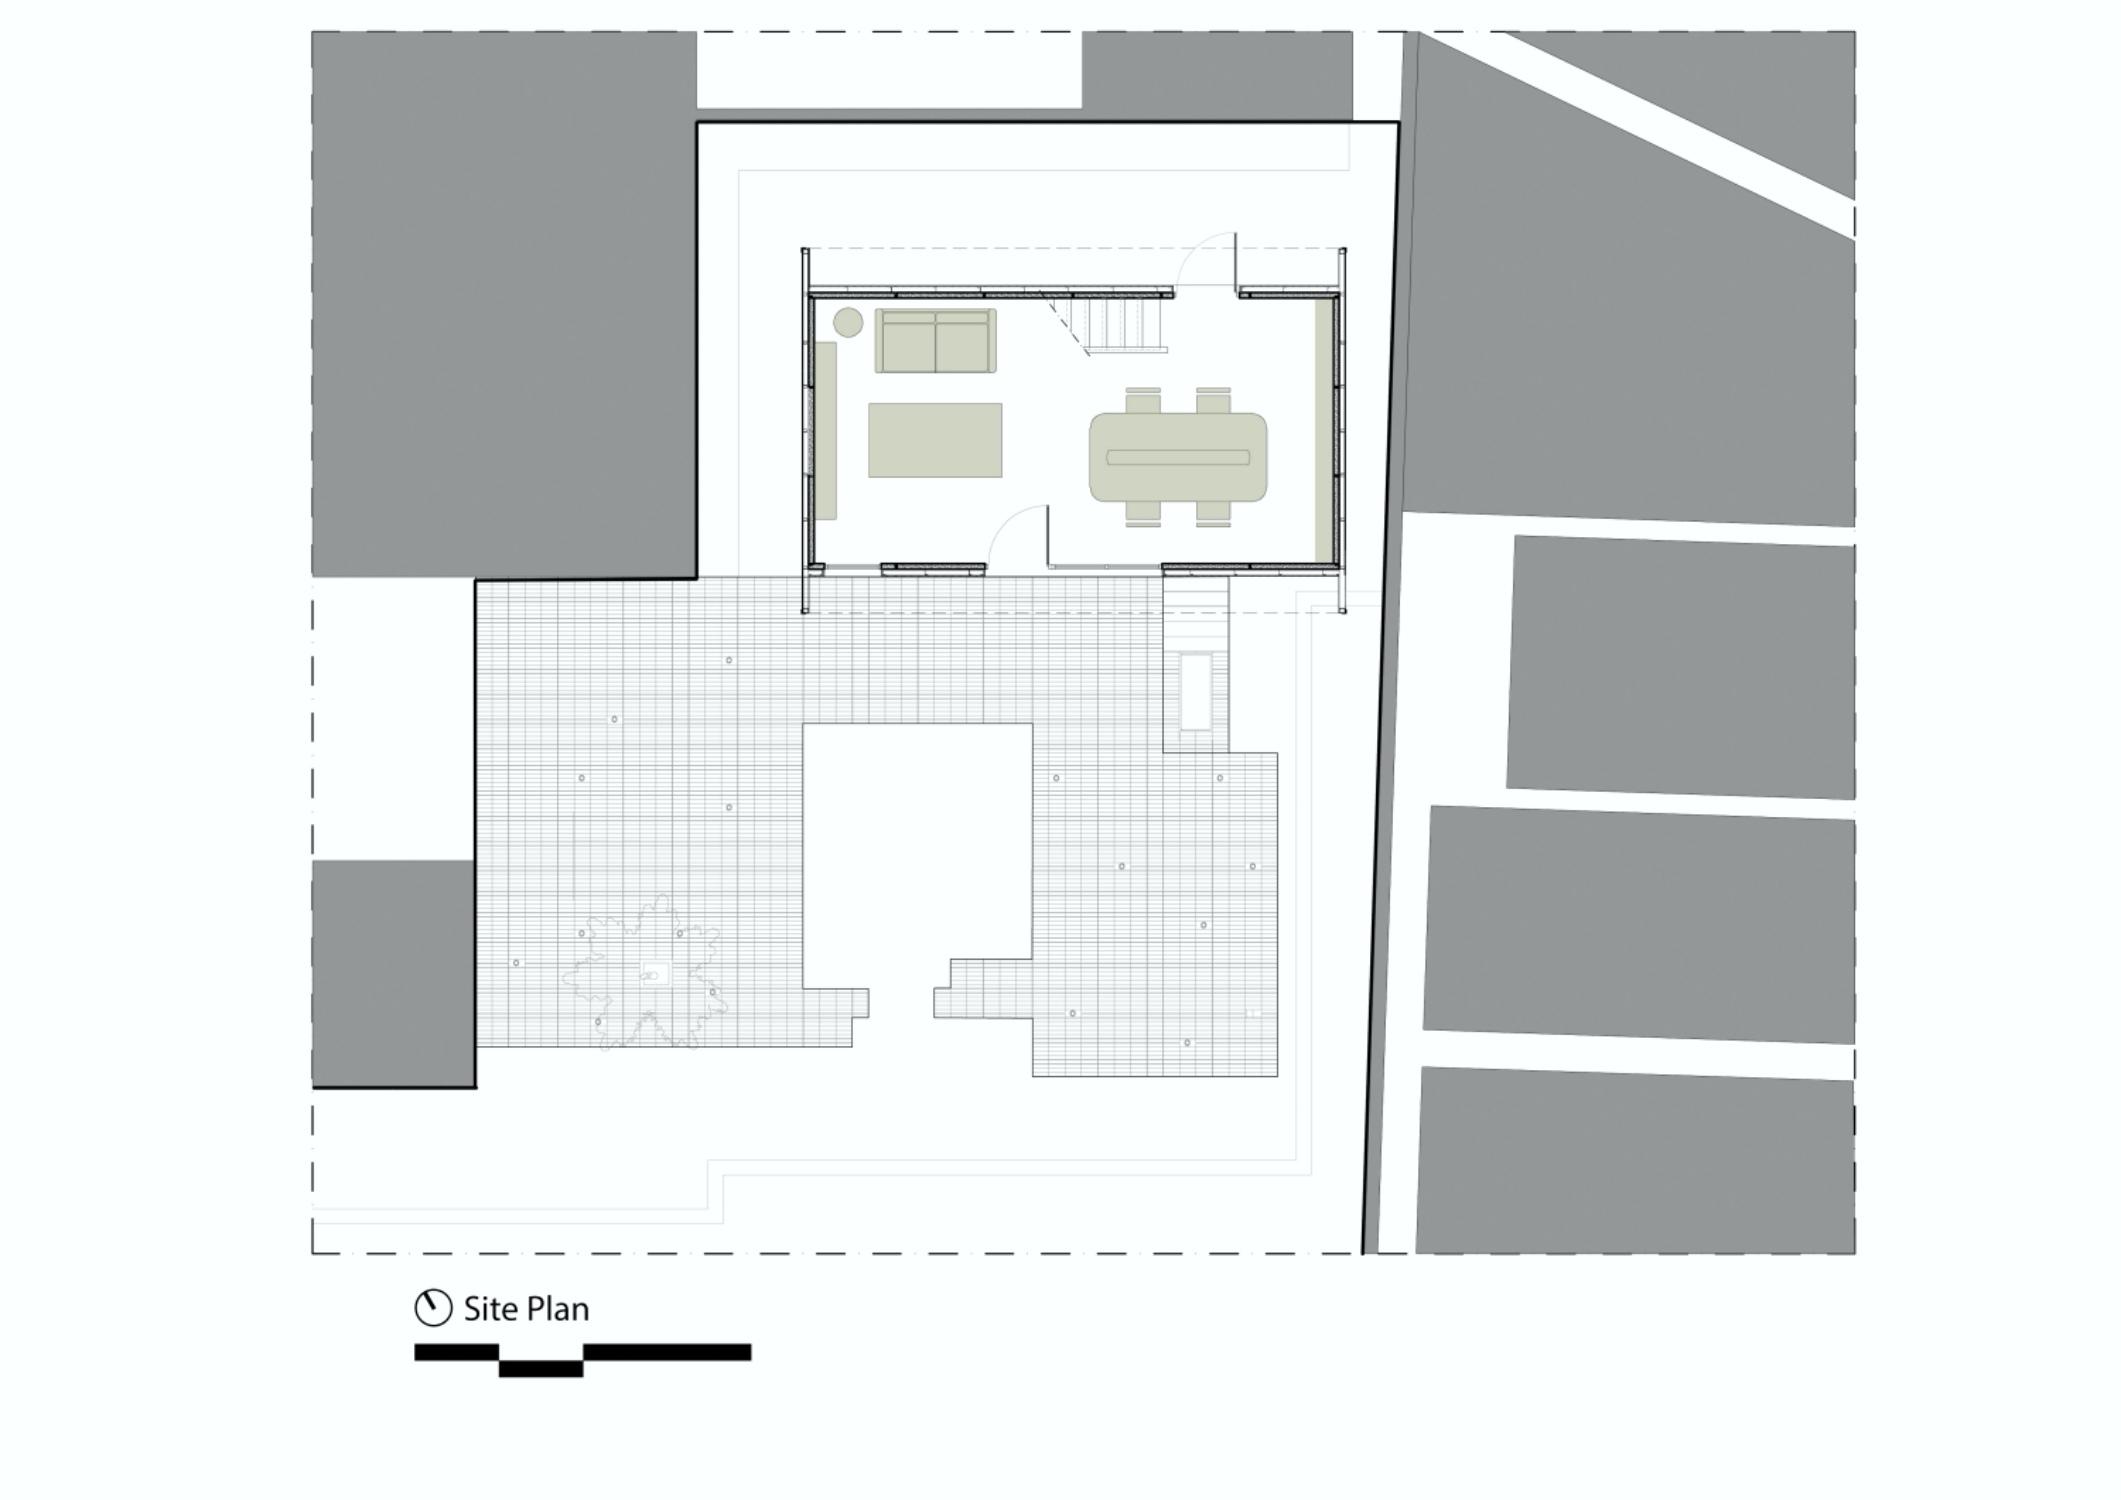 Site Plan Gea Sentanu}